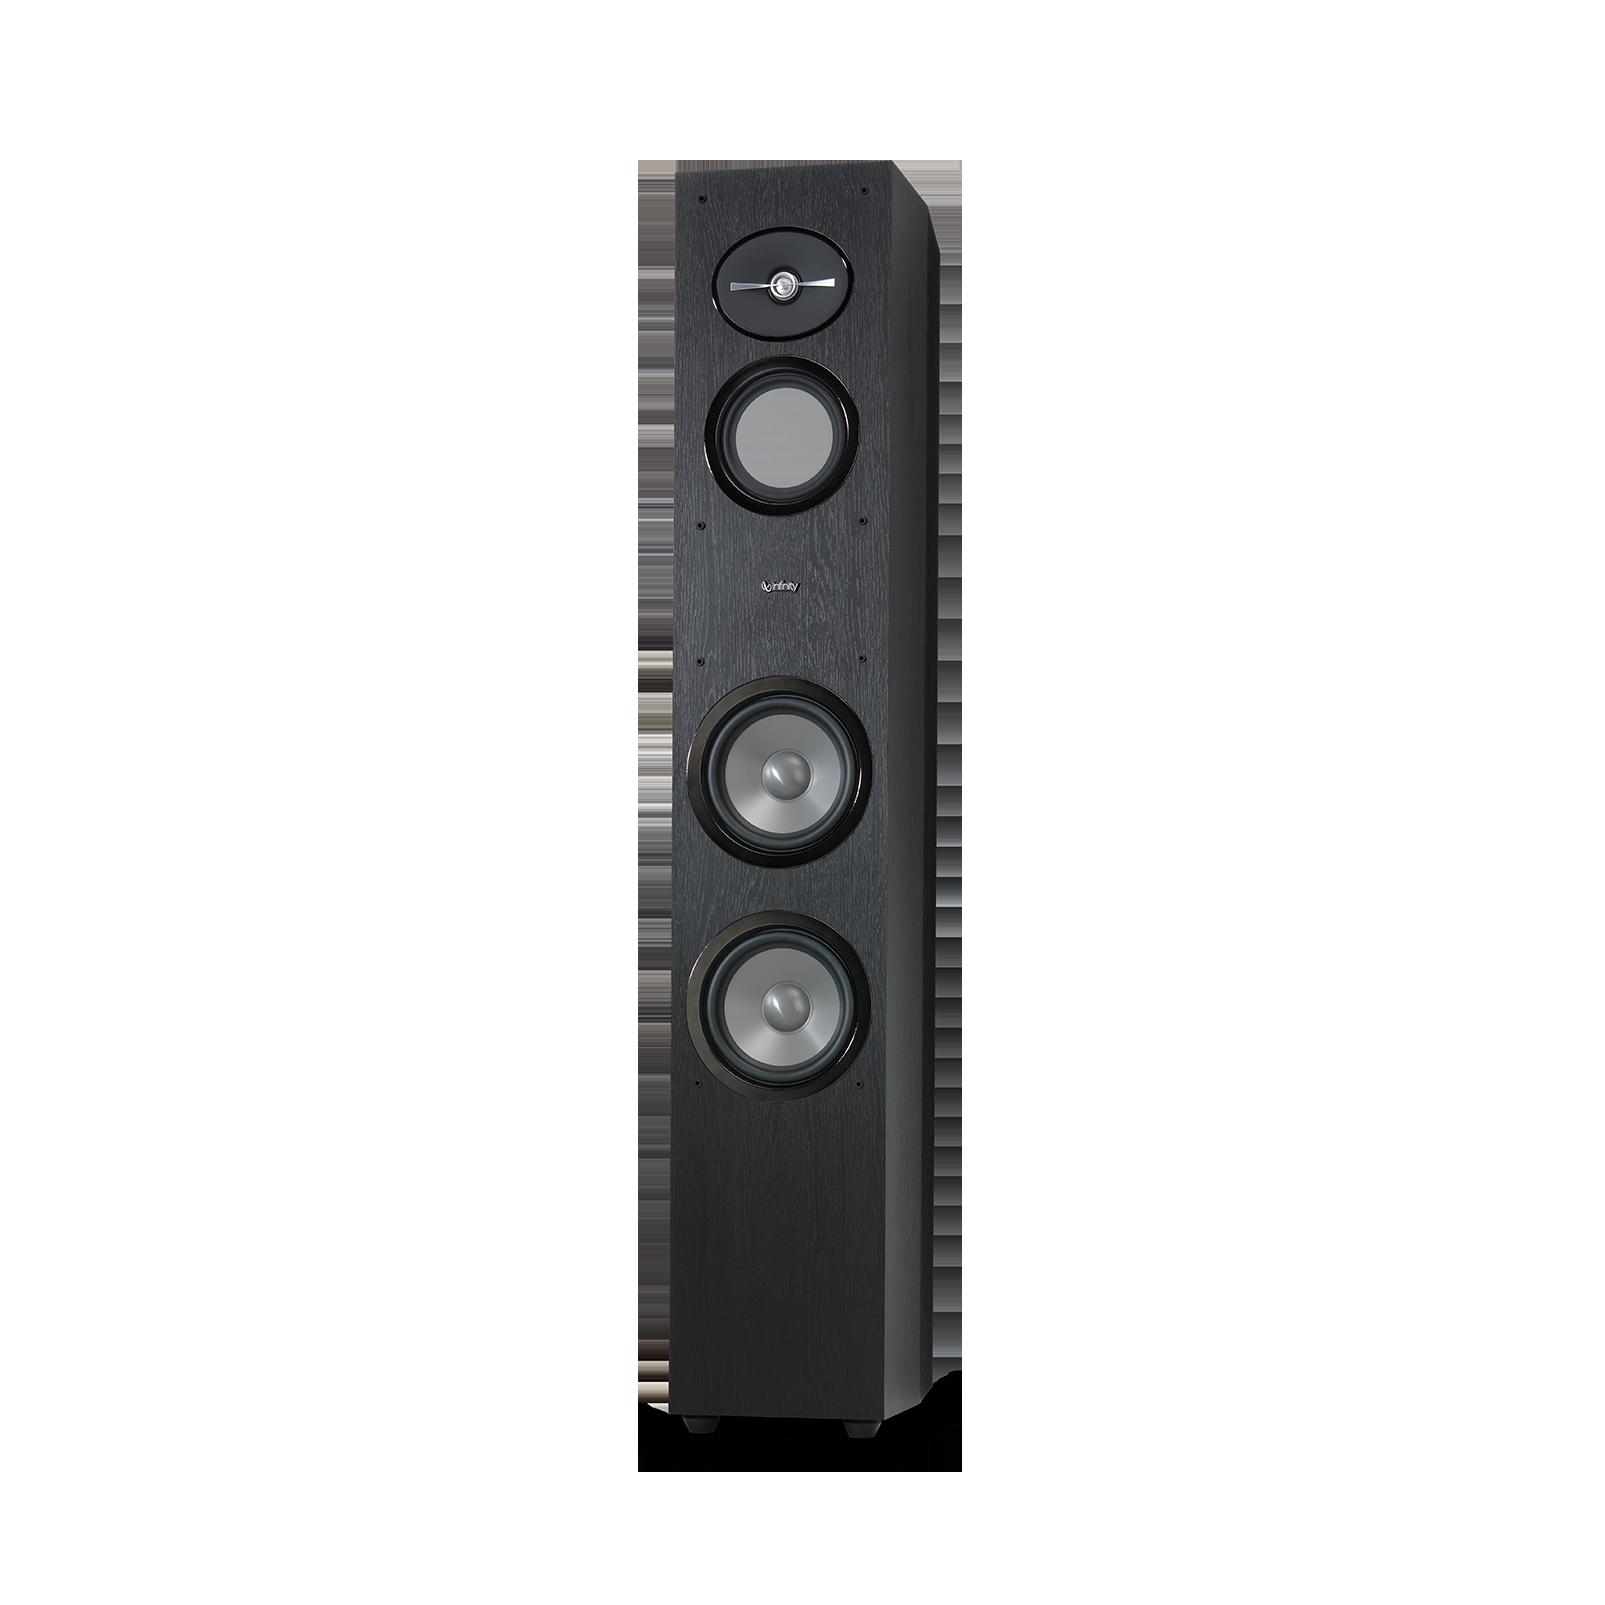 "Reference 263 - Black - 6-1/2"" 3-Way Floorstanding Loudspeaker - Front"